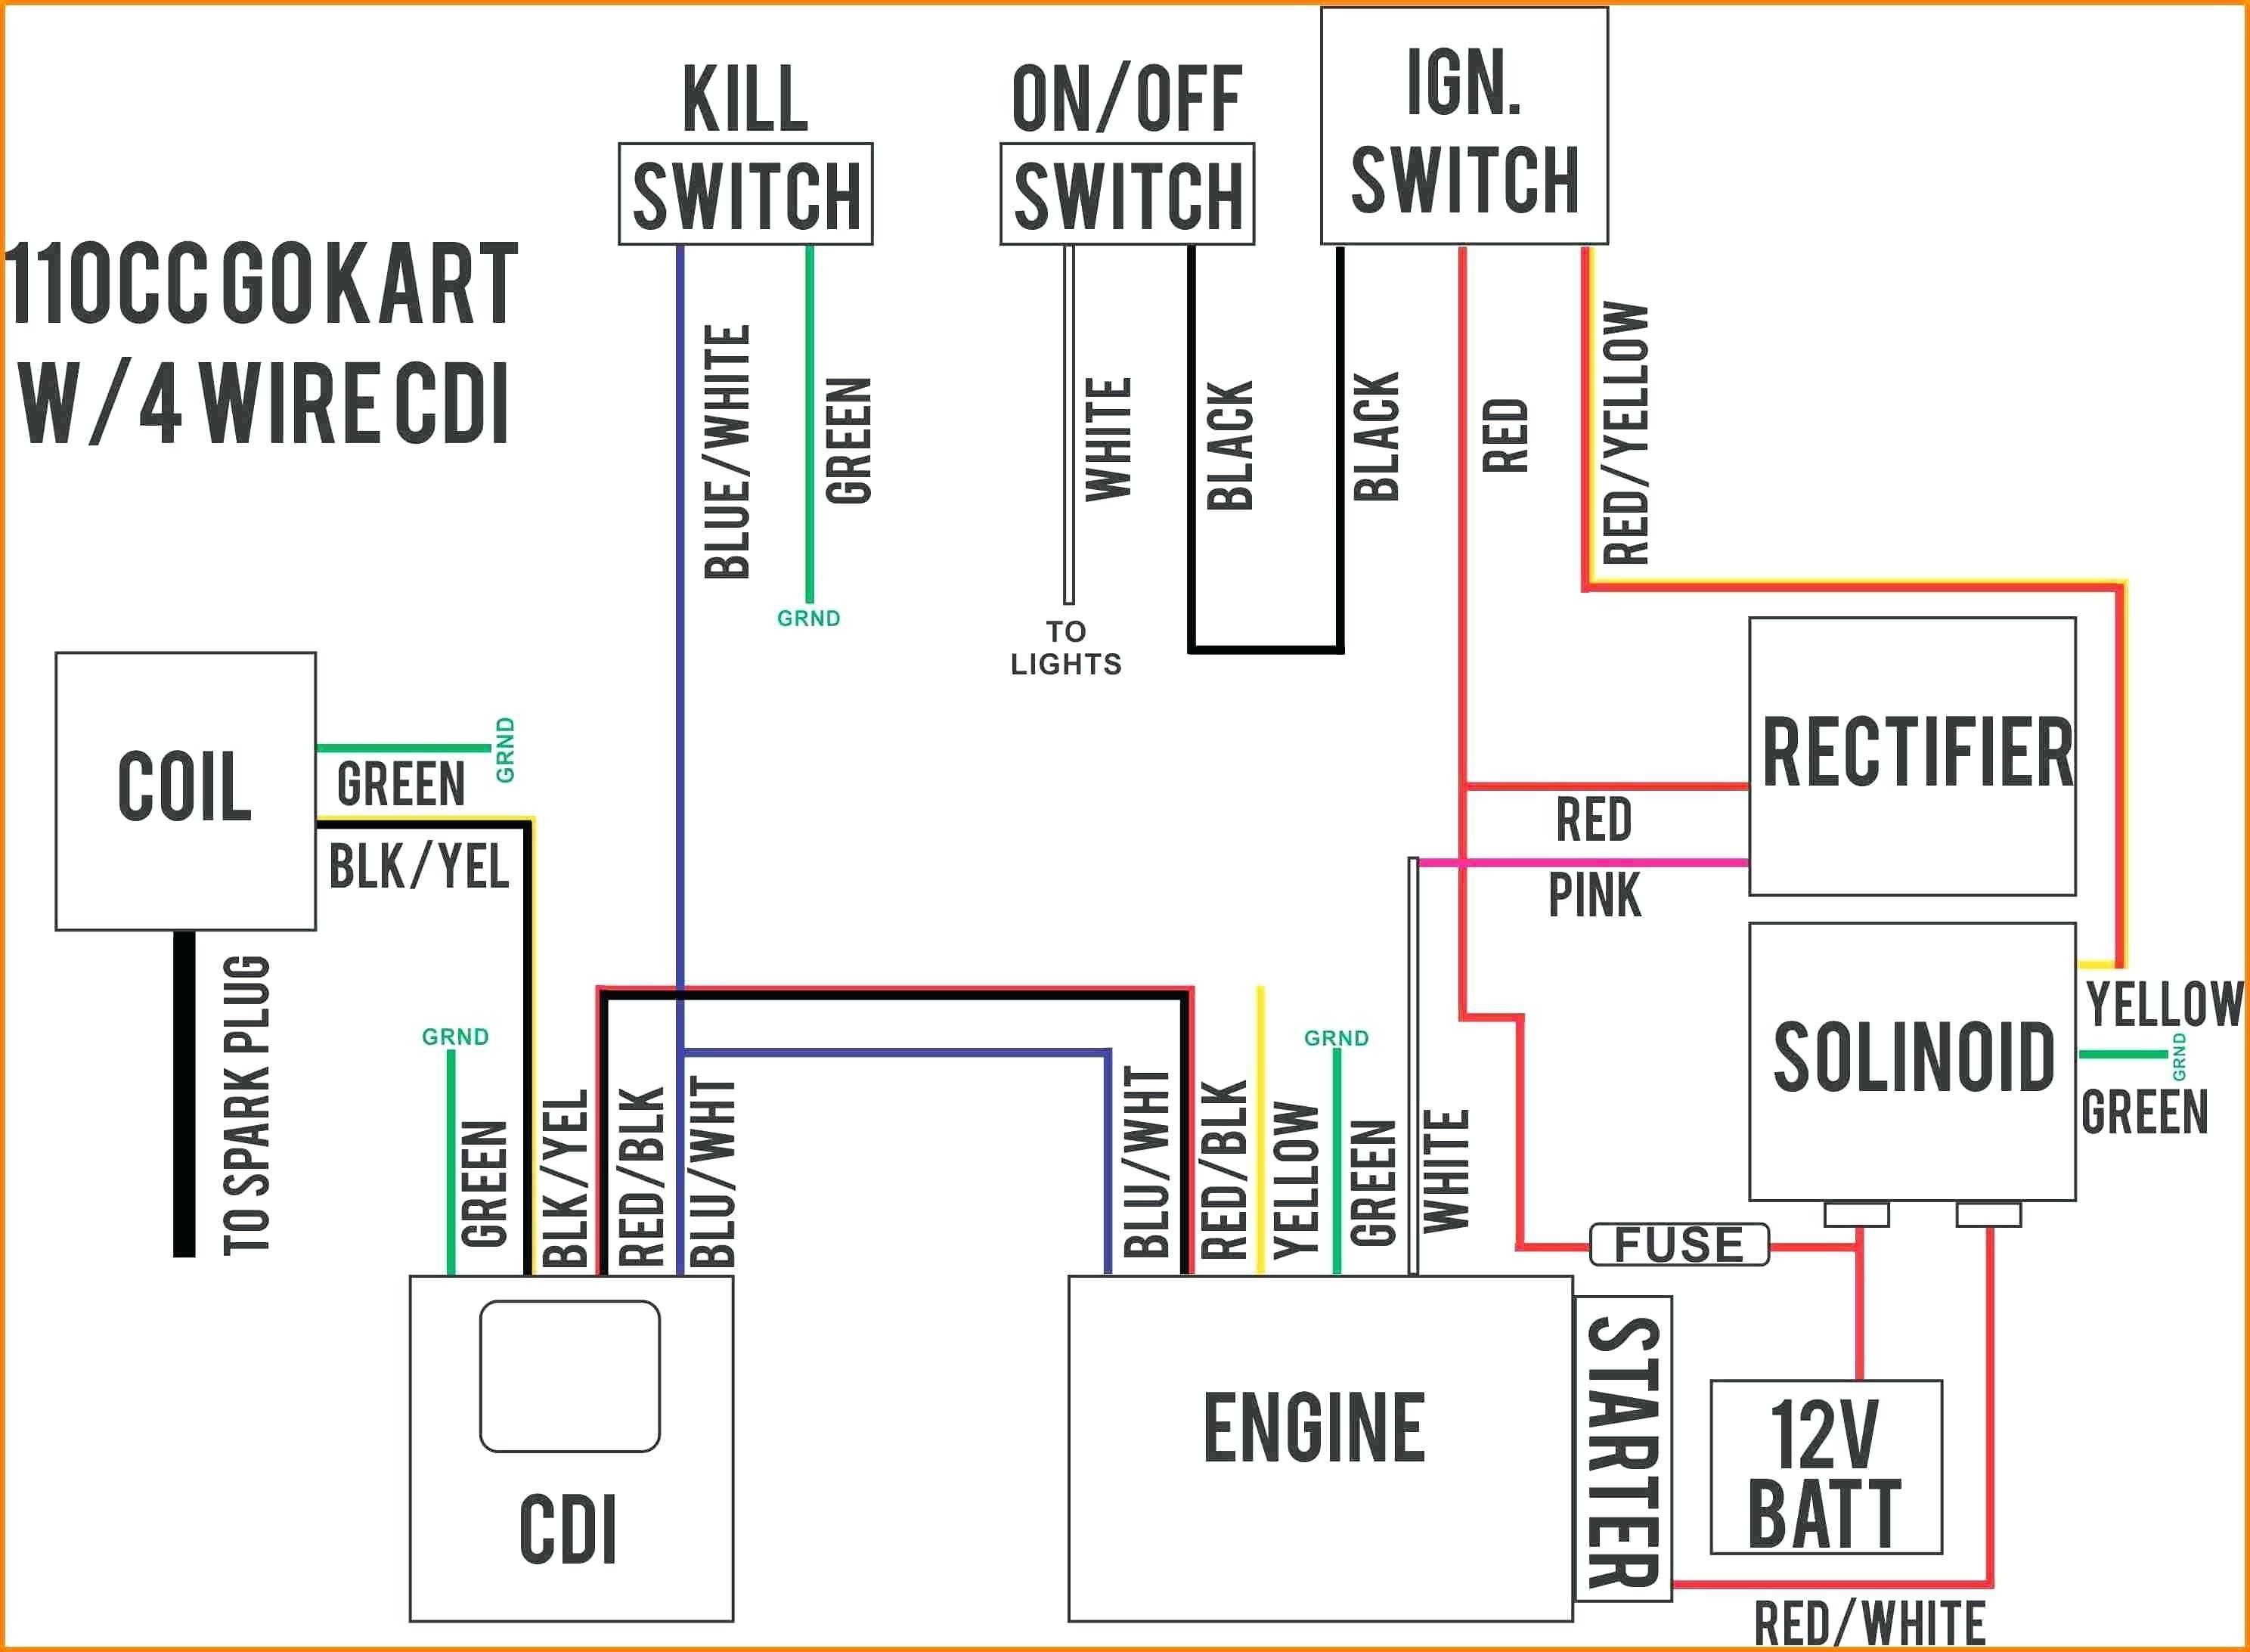 Dirt Bike Engine Diagram 125cc Chinese Engine Wiring Diagram Worksheet and Wiring Diagram • Of Dirt Bike Engine Diagram